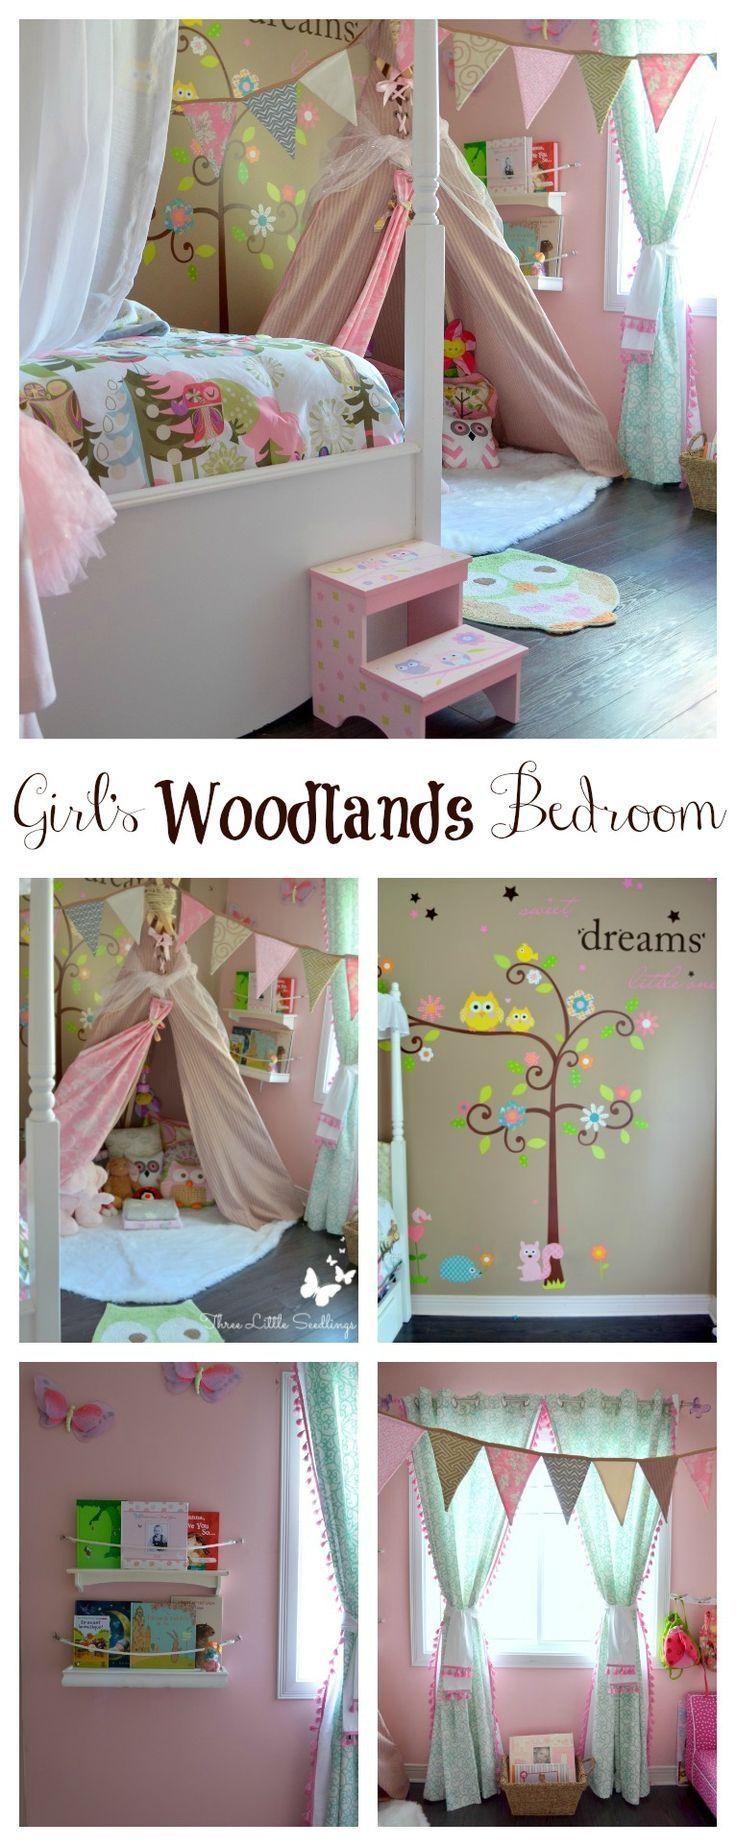 Girl's Woodlands Bedroom - So many great inexpensive DIYs - You'll love remodeling your little girl's bedroom - http://www.threelittleseedlings.com/girls-woodland-bedroom